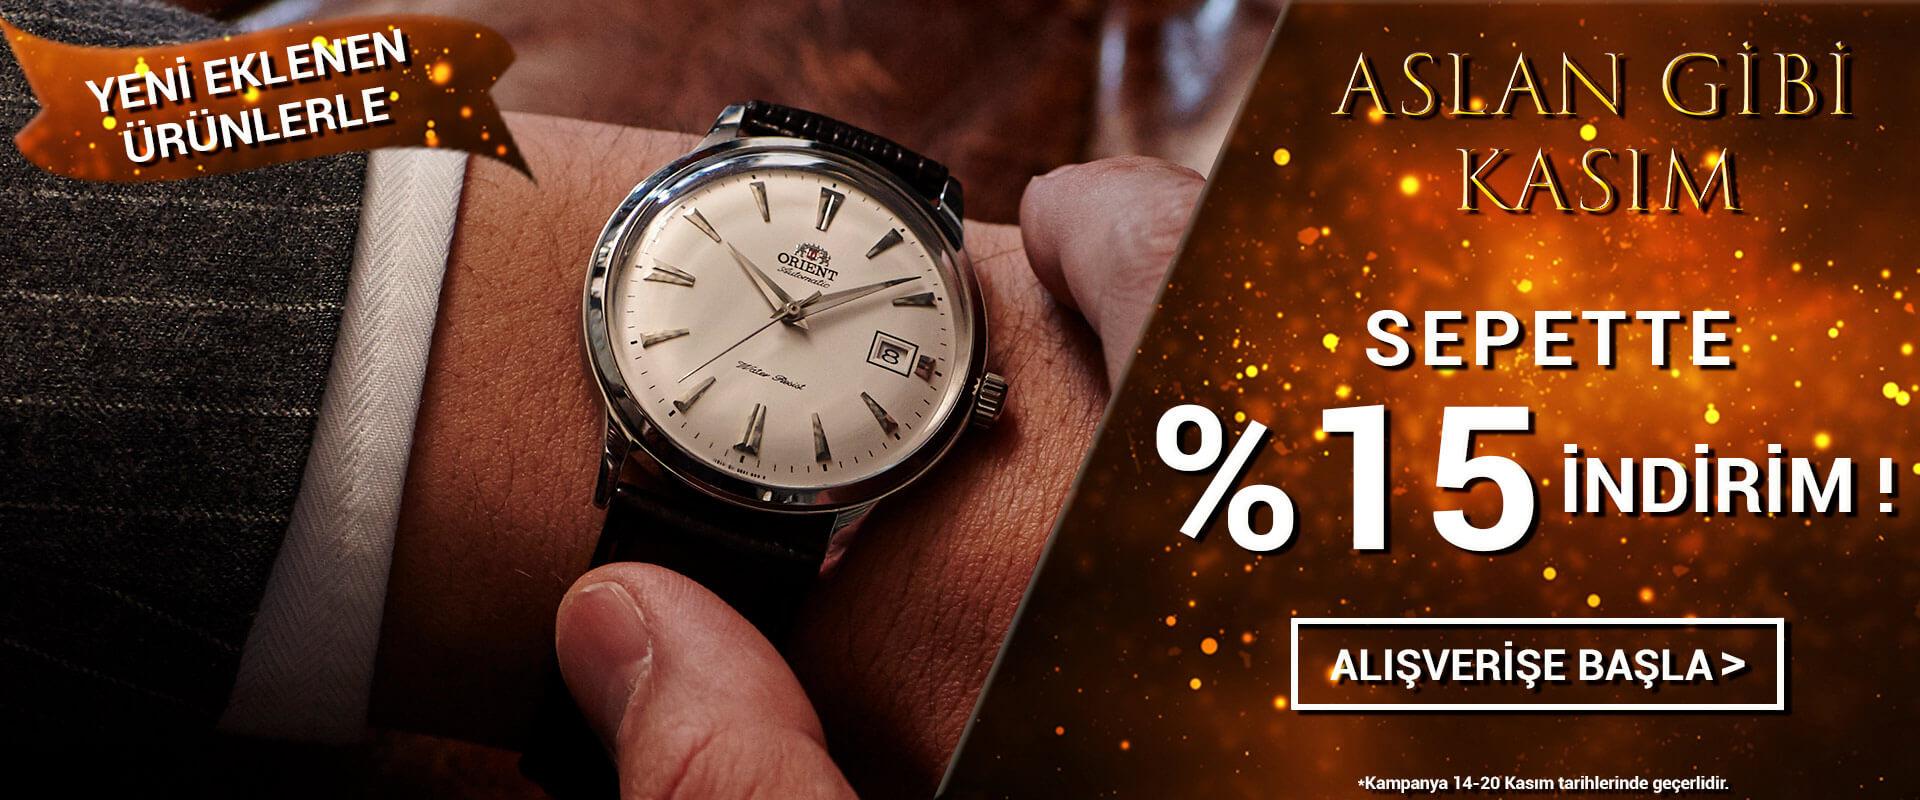 Aslan Gibi Kasım Orient Saat Sepette %15 İndirim